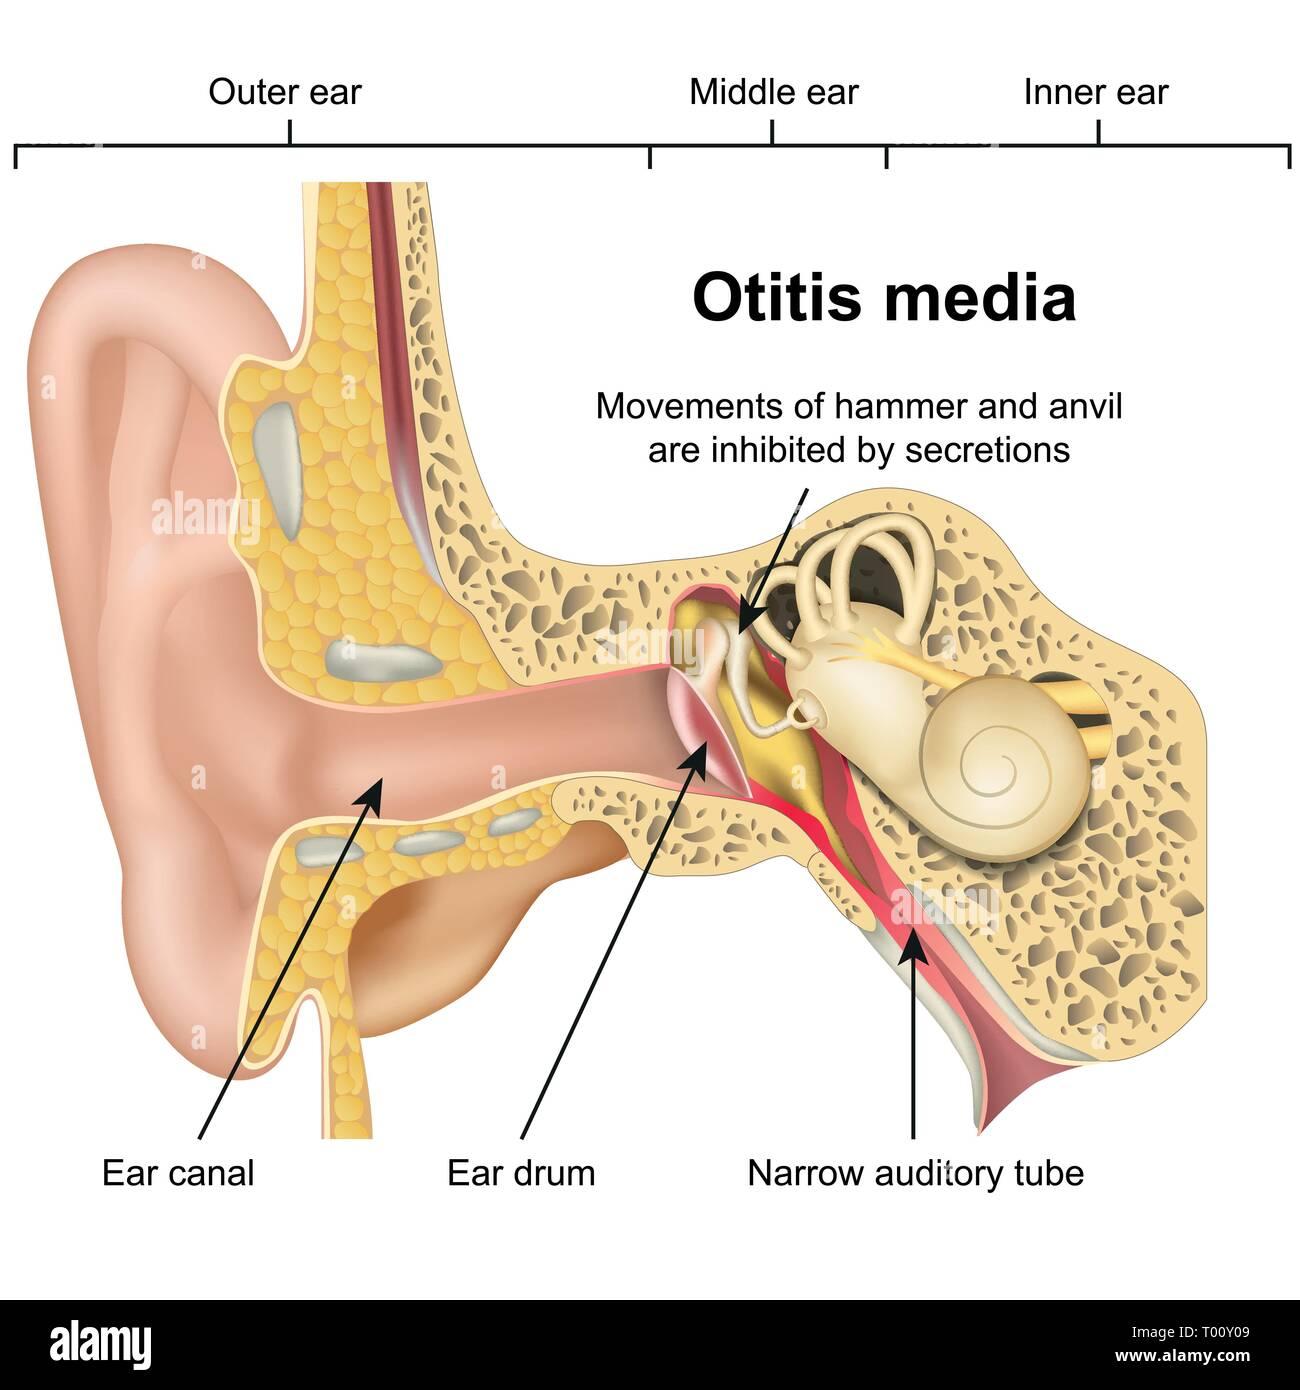 hight resolution of otitis media ear disease 3d medical vector illustration on white background stock image